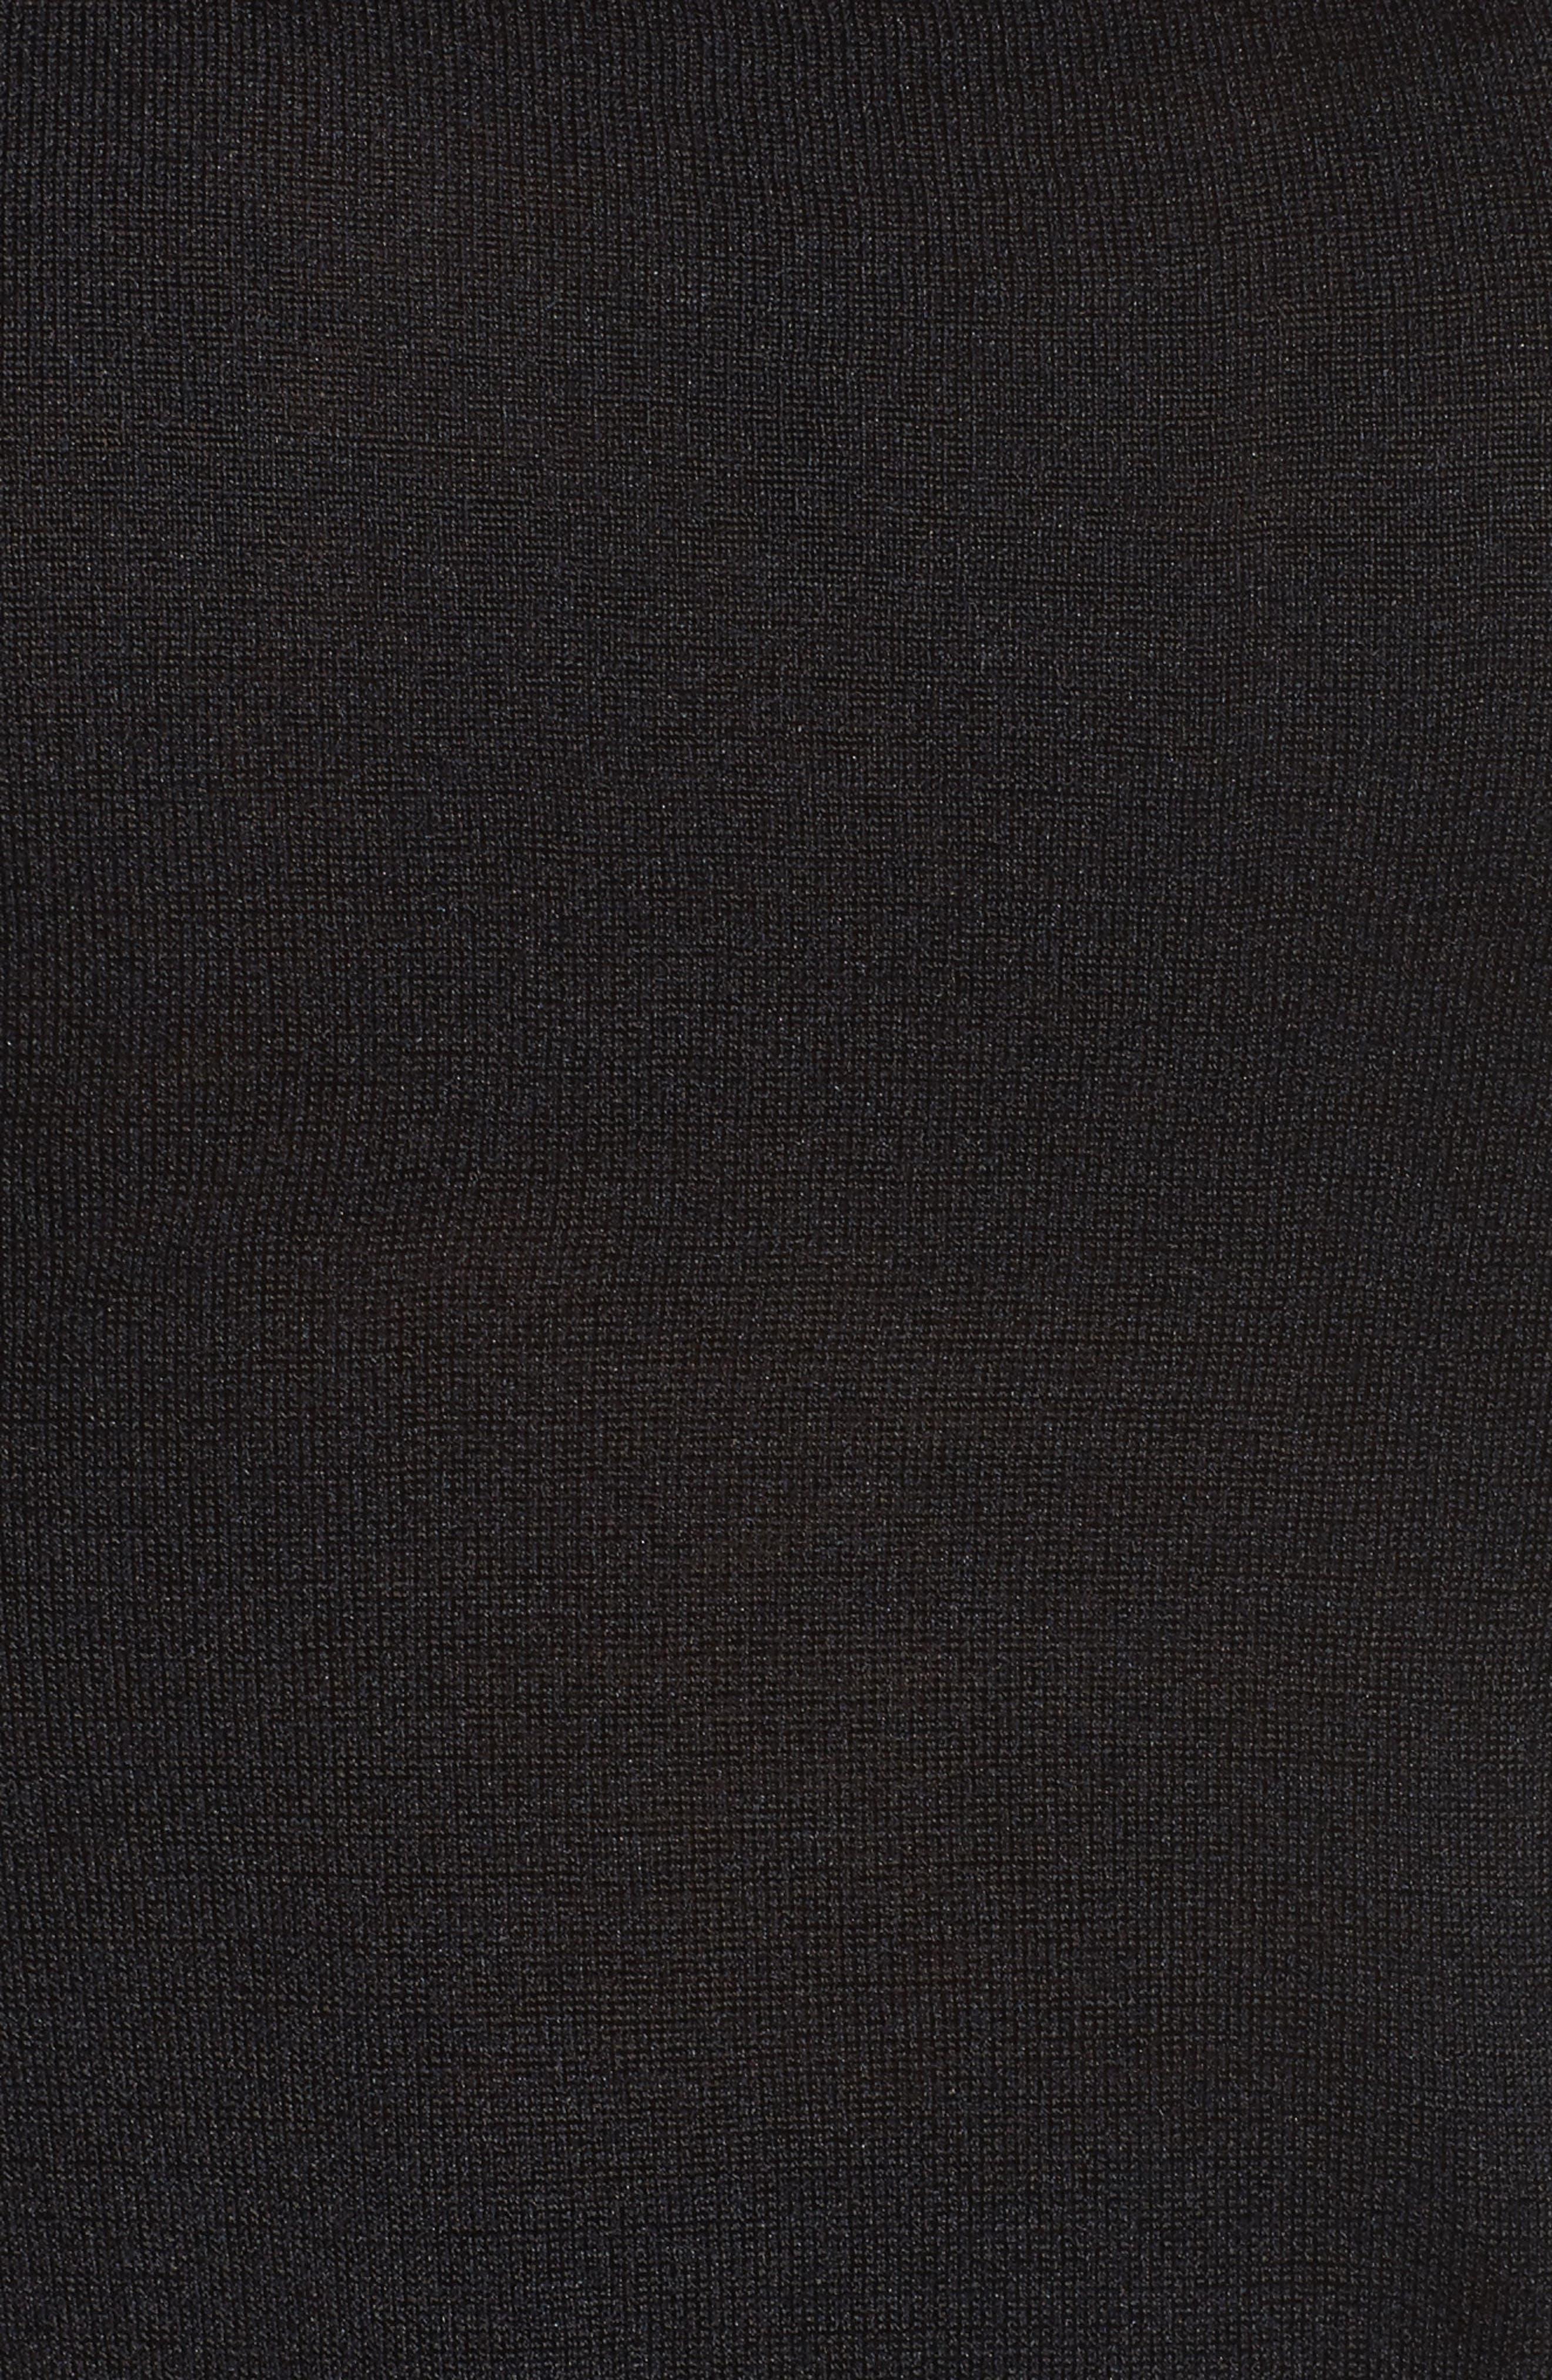 Chiffon Trim Tank,                             Alternate thumbnail 6, color,                             BLACK ONYX